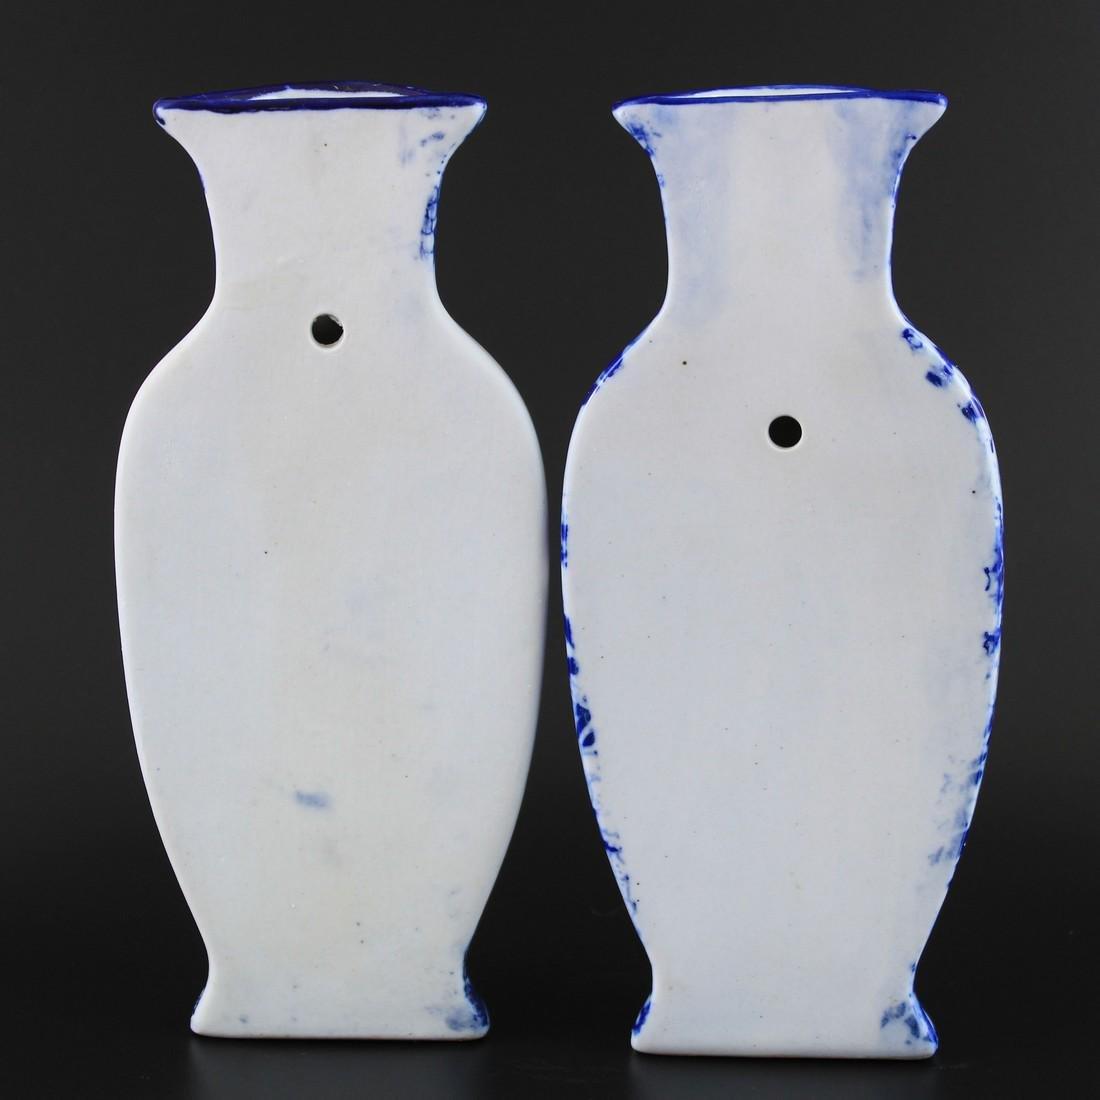 2 Vintage Chinese Blue & White Porcelain Wall Vases - 5